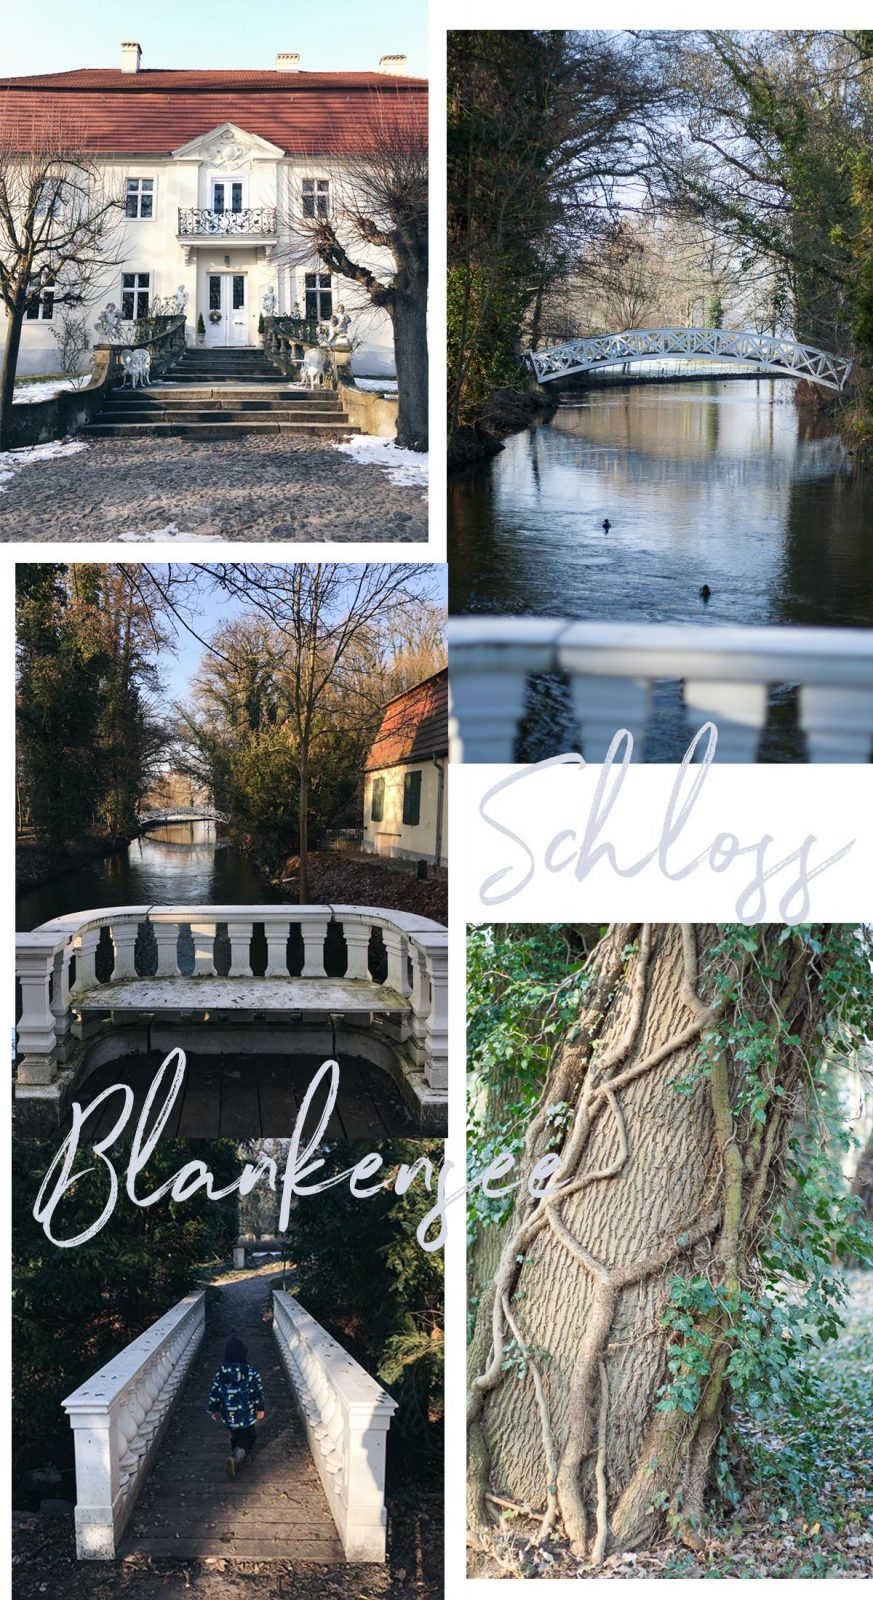 Flaeming Brandenburg Schloss Blankensee / Pinspiration